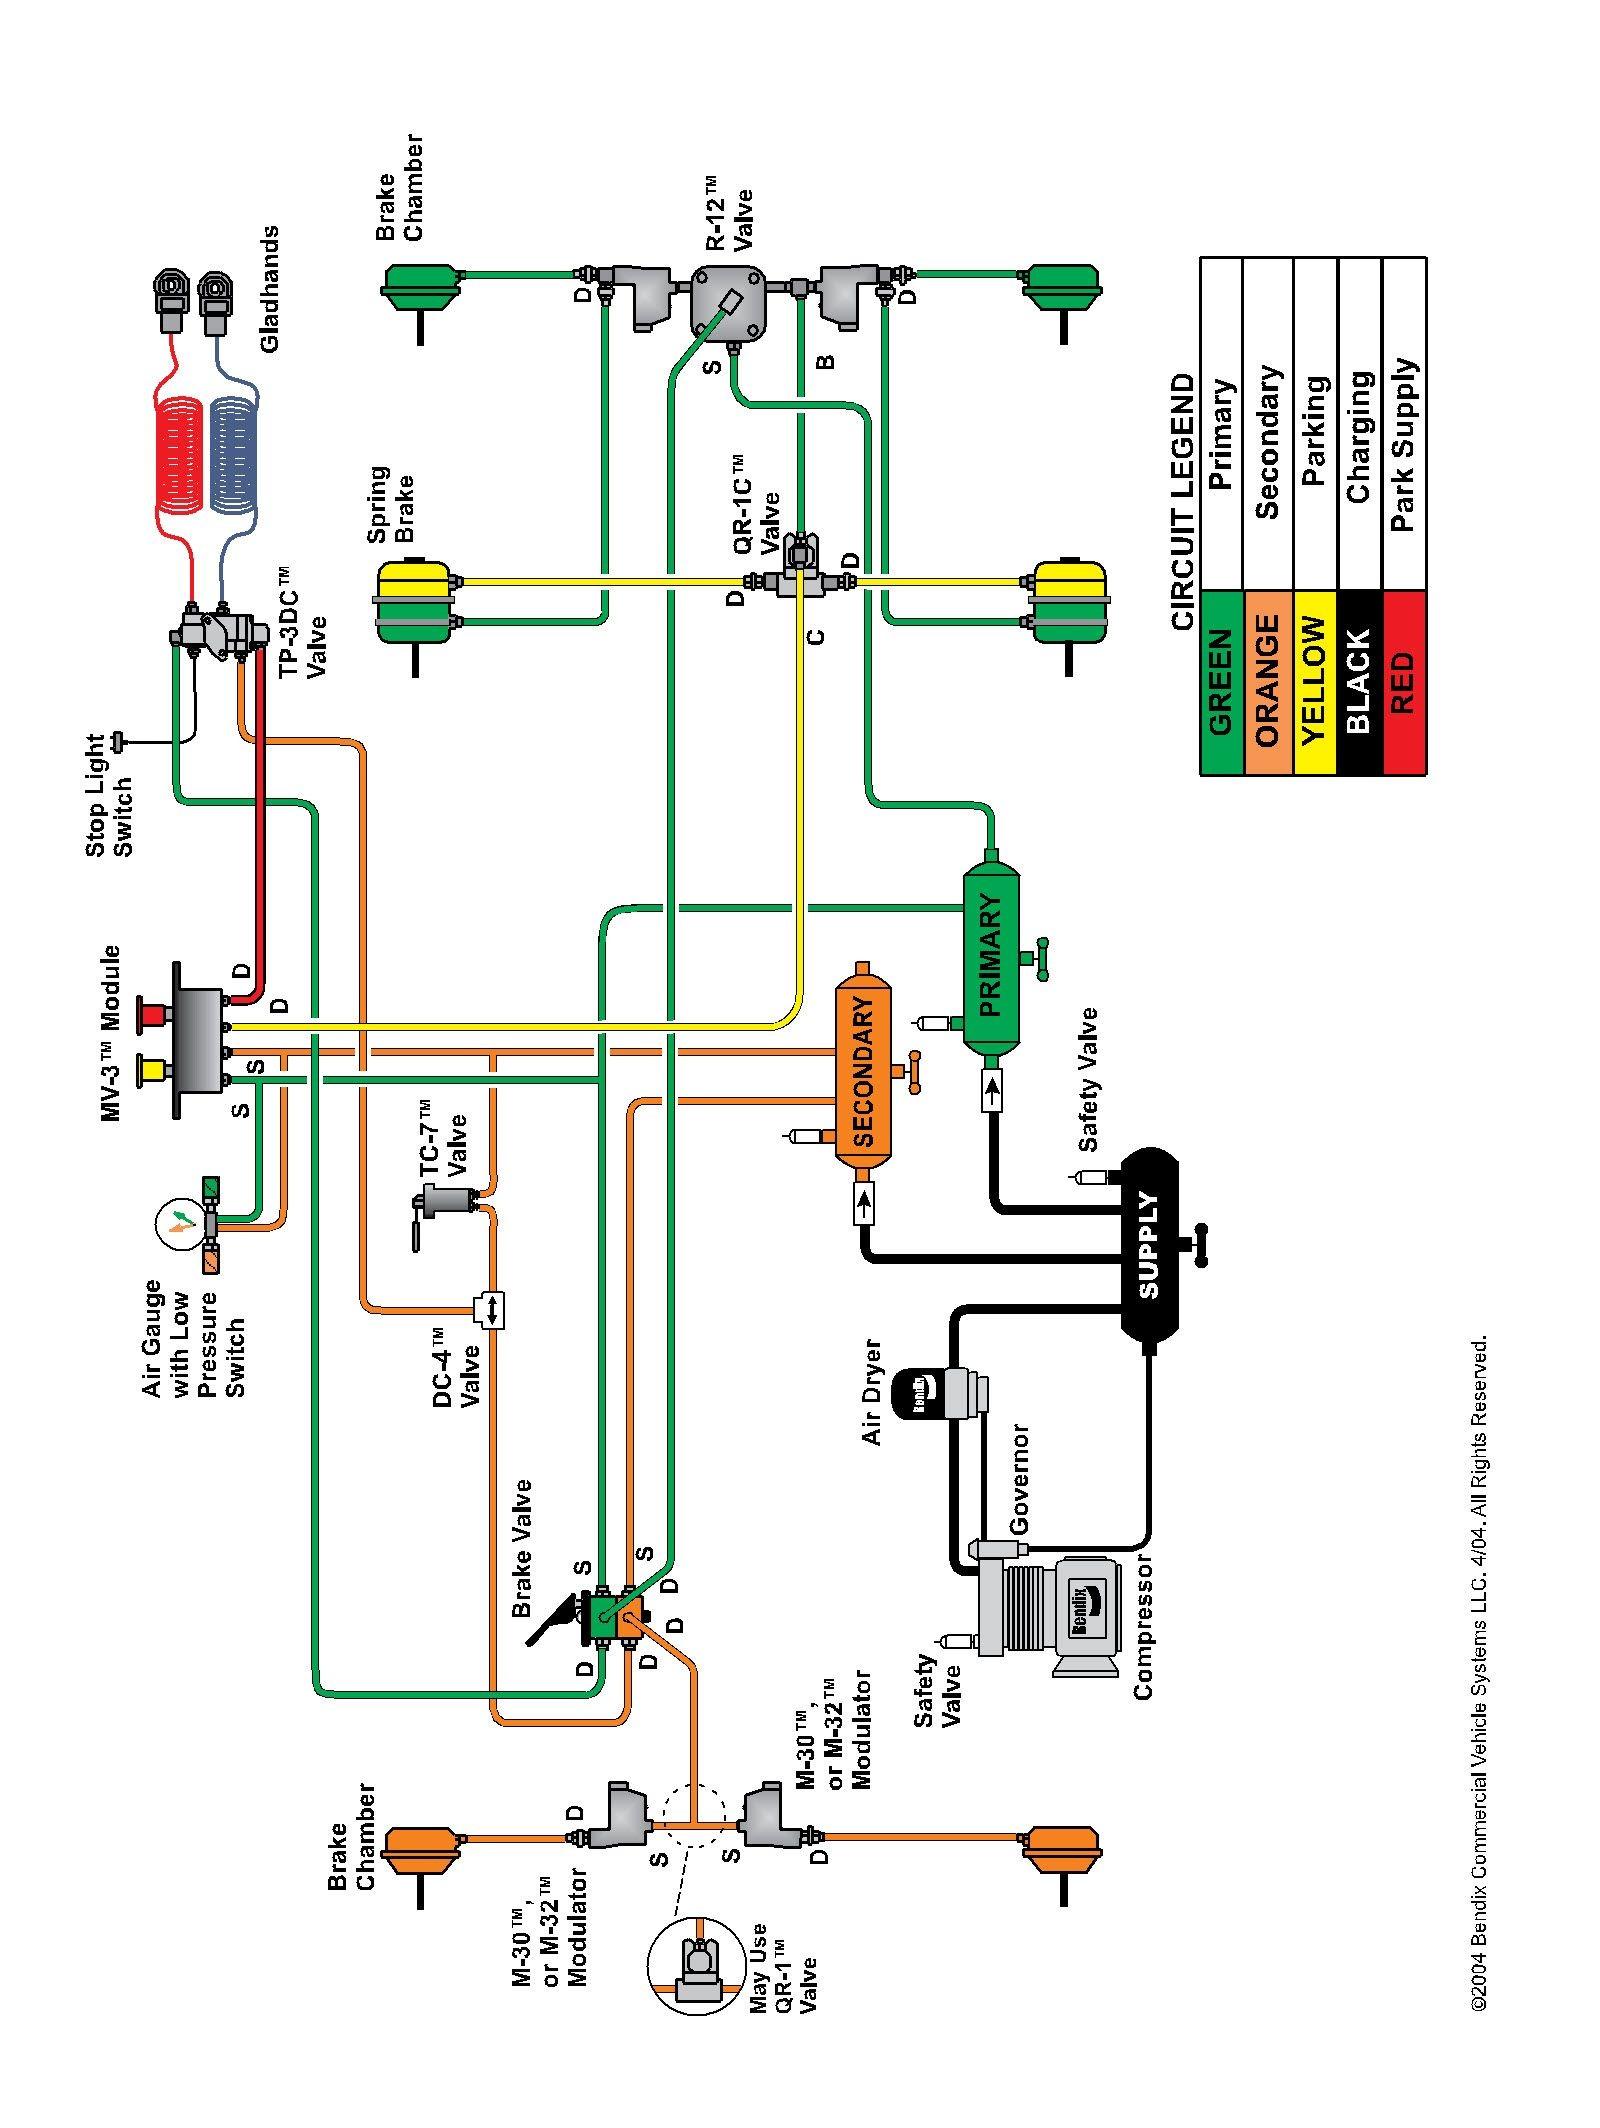 Brake Chamber Diagram 2012 02 12 2 12 2012 4 24 29 Pm 1600—2128 Of Brake Chamber Diagram